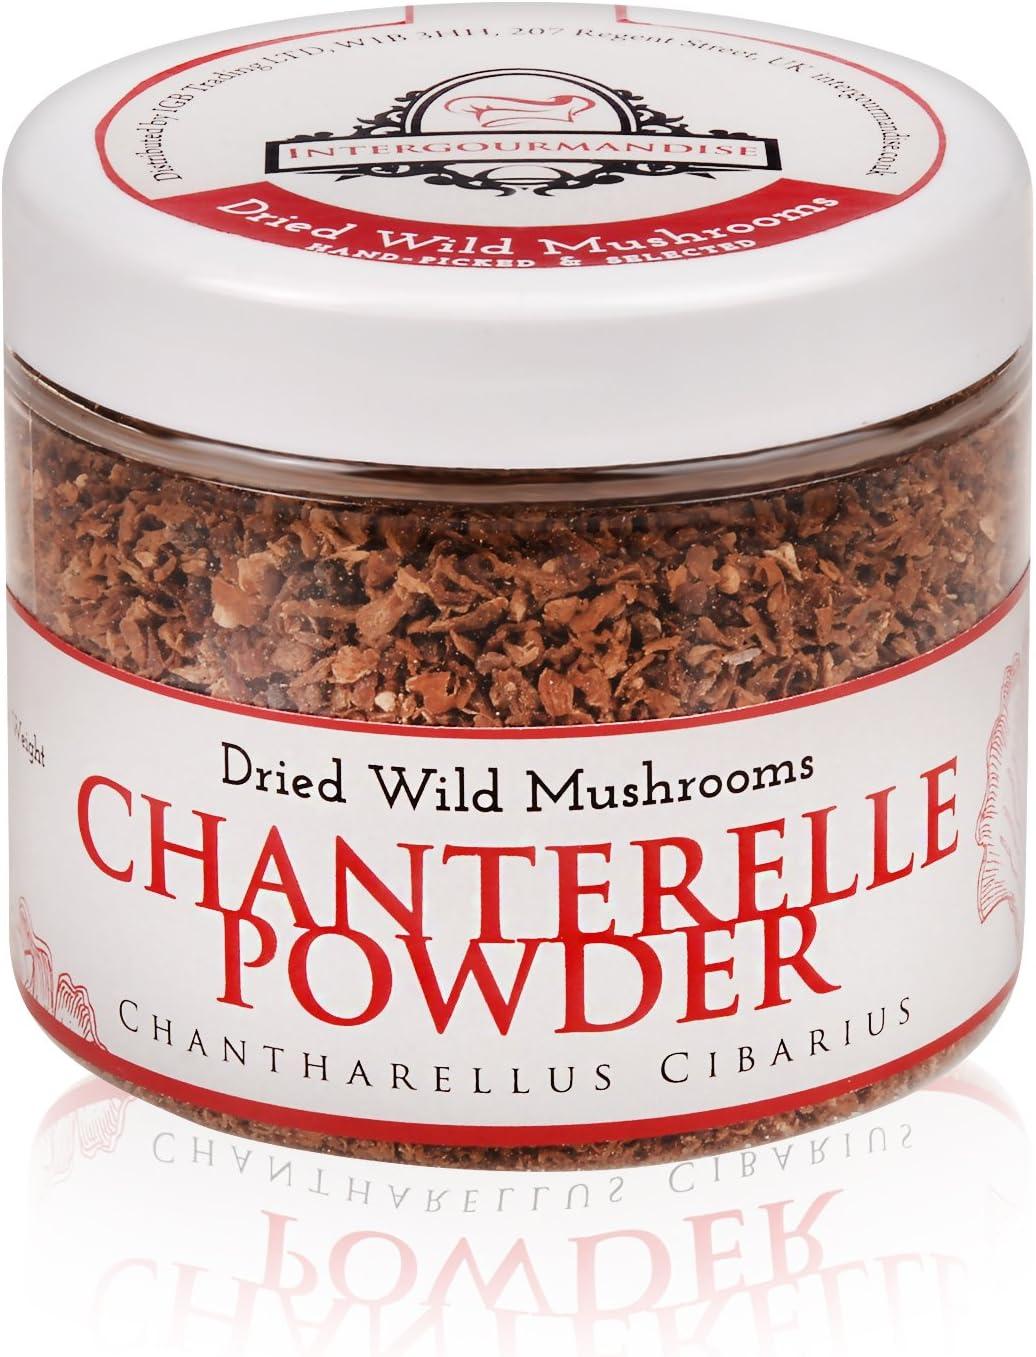 Chanterelle Powder 2.8 oz. 80 gr Popular brand in Same day shipping the world Vegan Plastic jar Veg